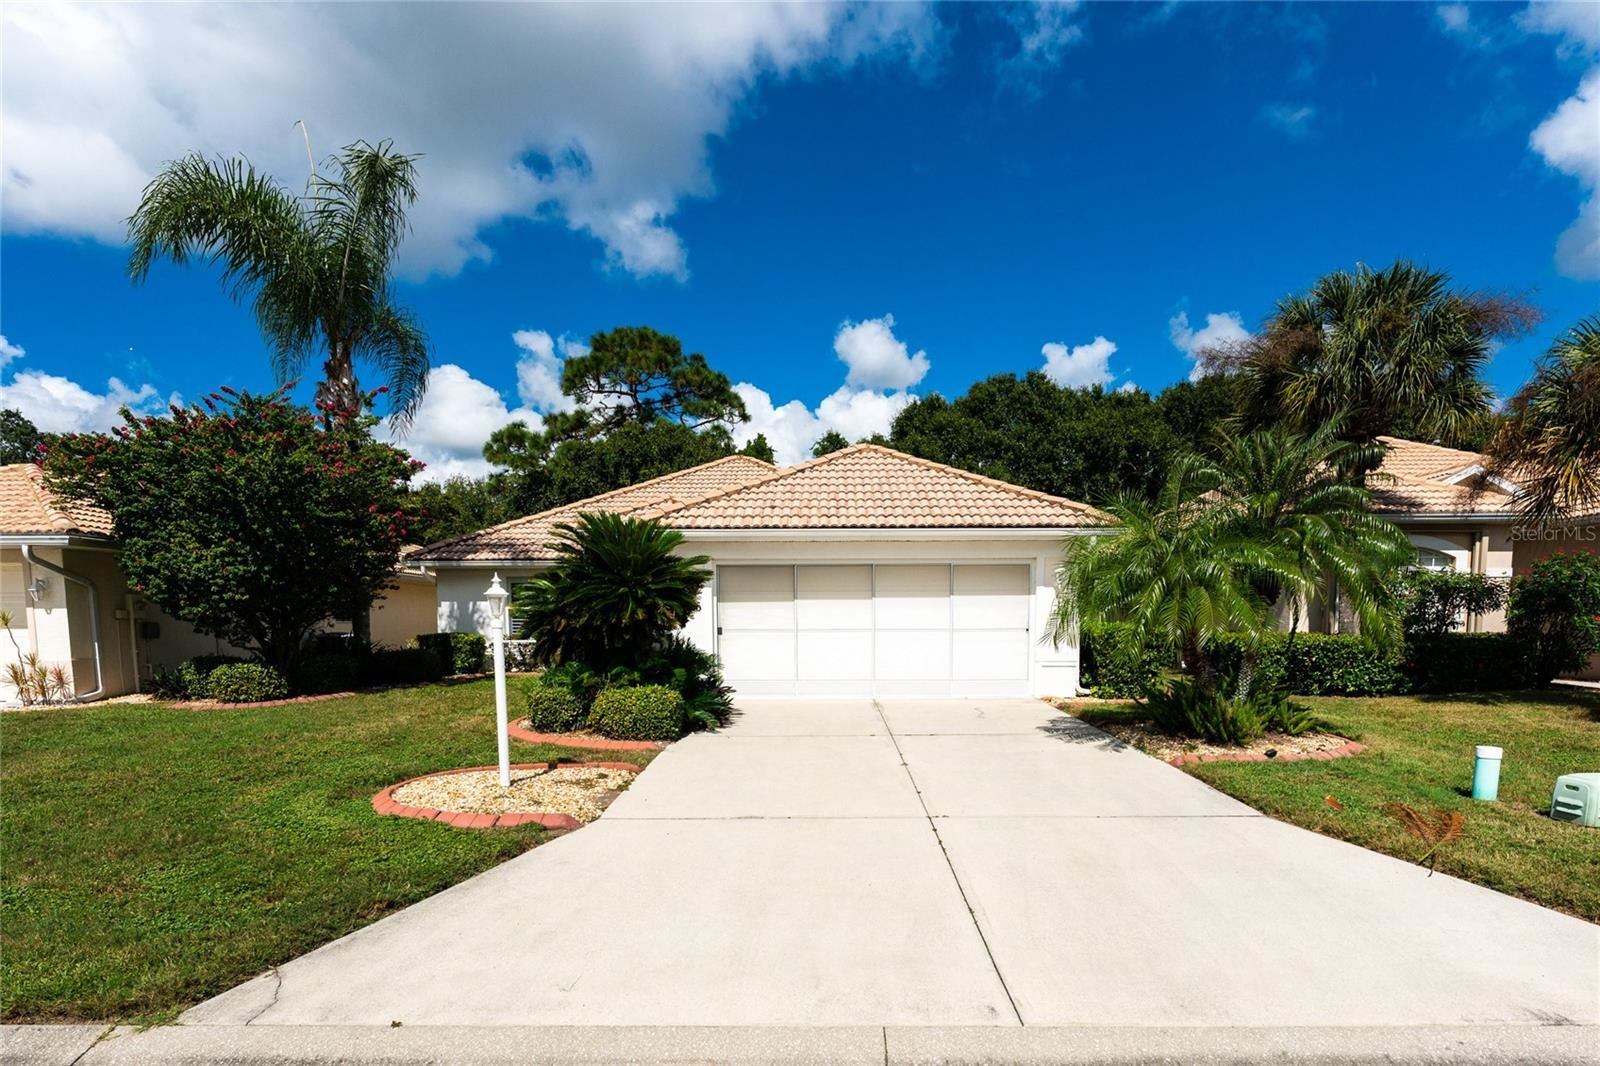 Photo of 8466 GATEWAY COURT, ENGLEWOOD, FL 34224 (MLS # D6121655)